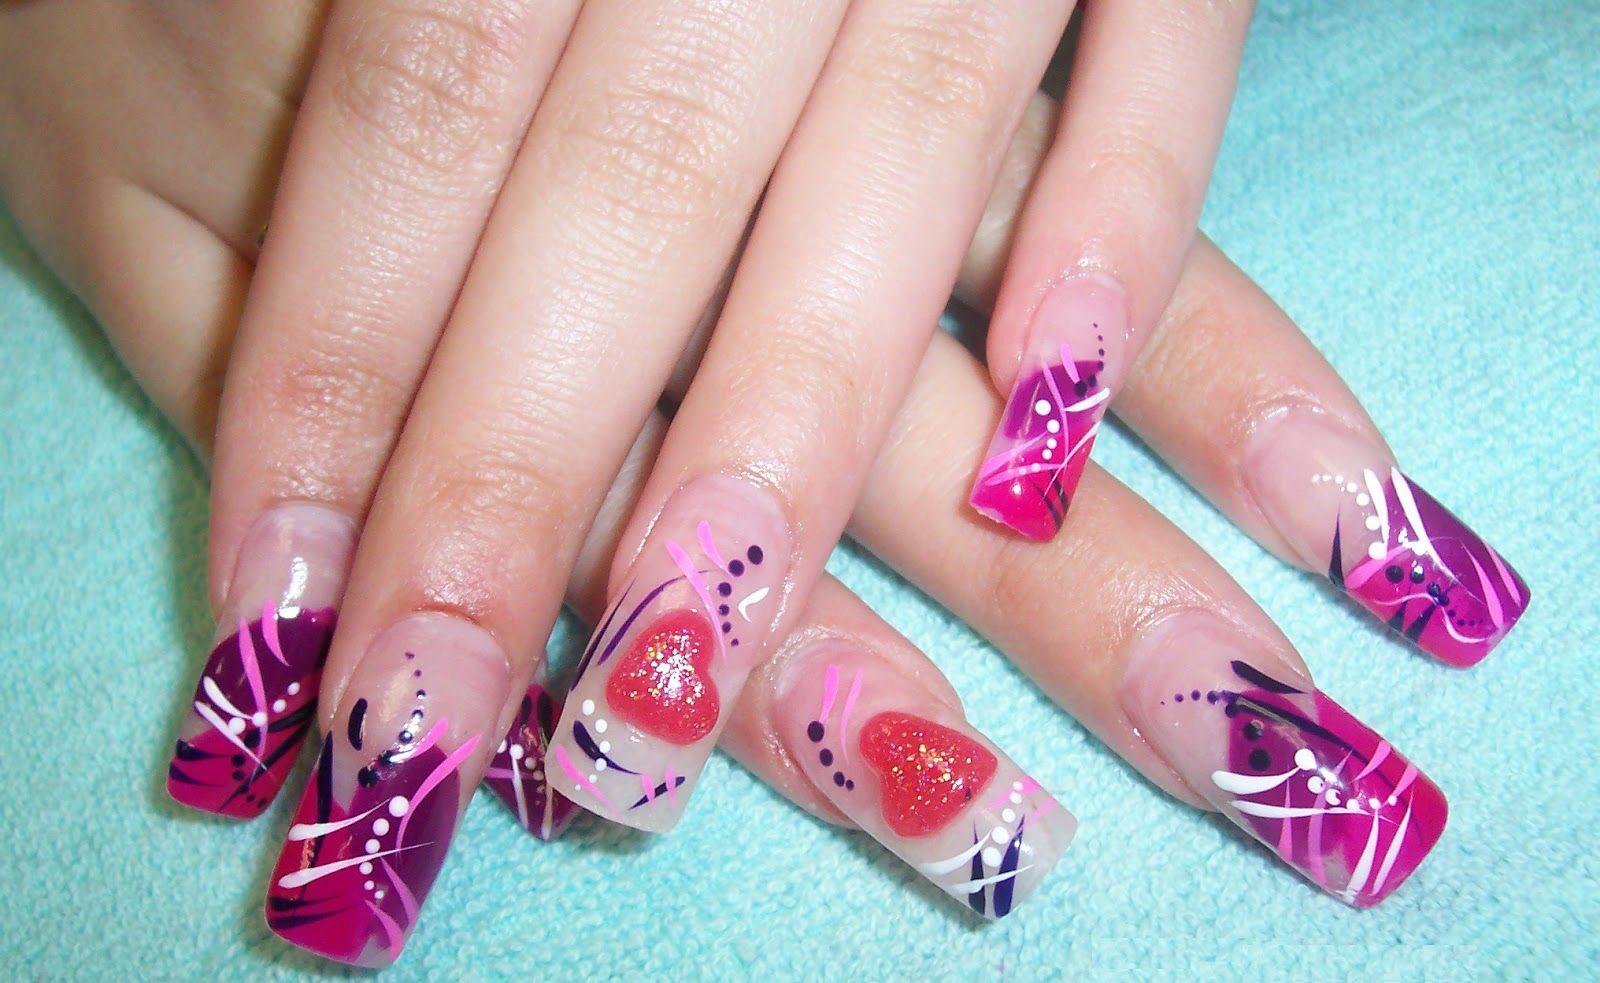 Valentineu0027s+Day+3D+Nail+Art | Valentineu0027s Day Nail Designs Idea 2014